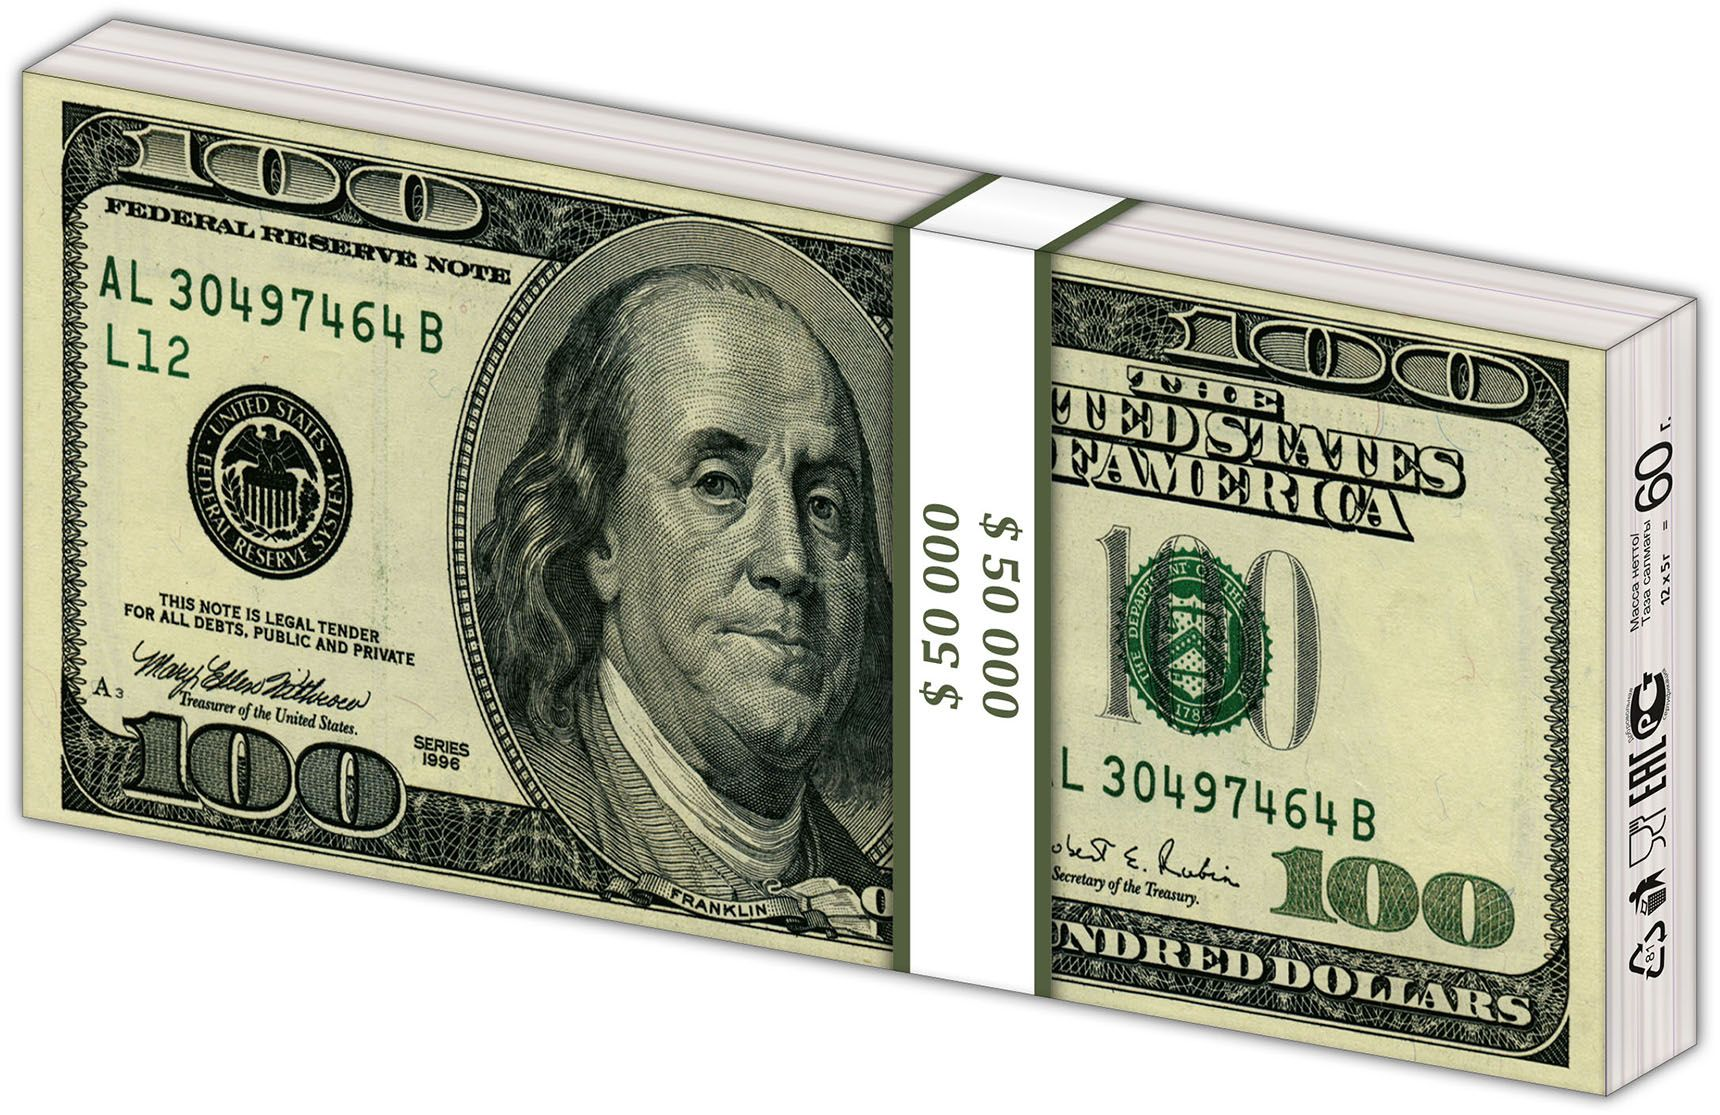 фото доллара для печати своё имя, номер